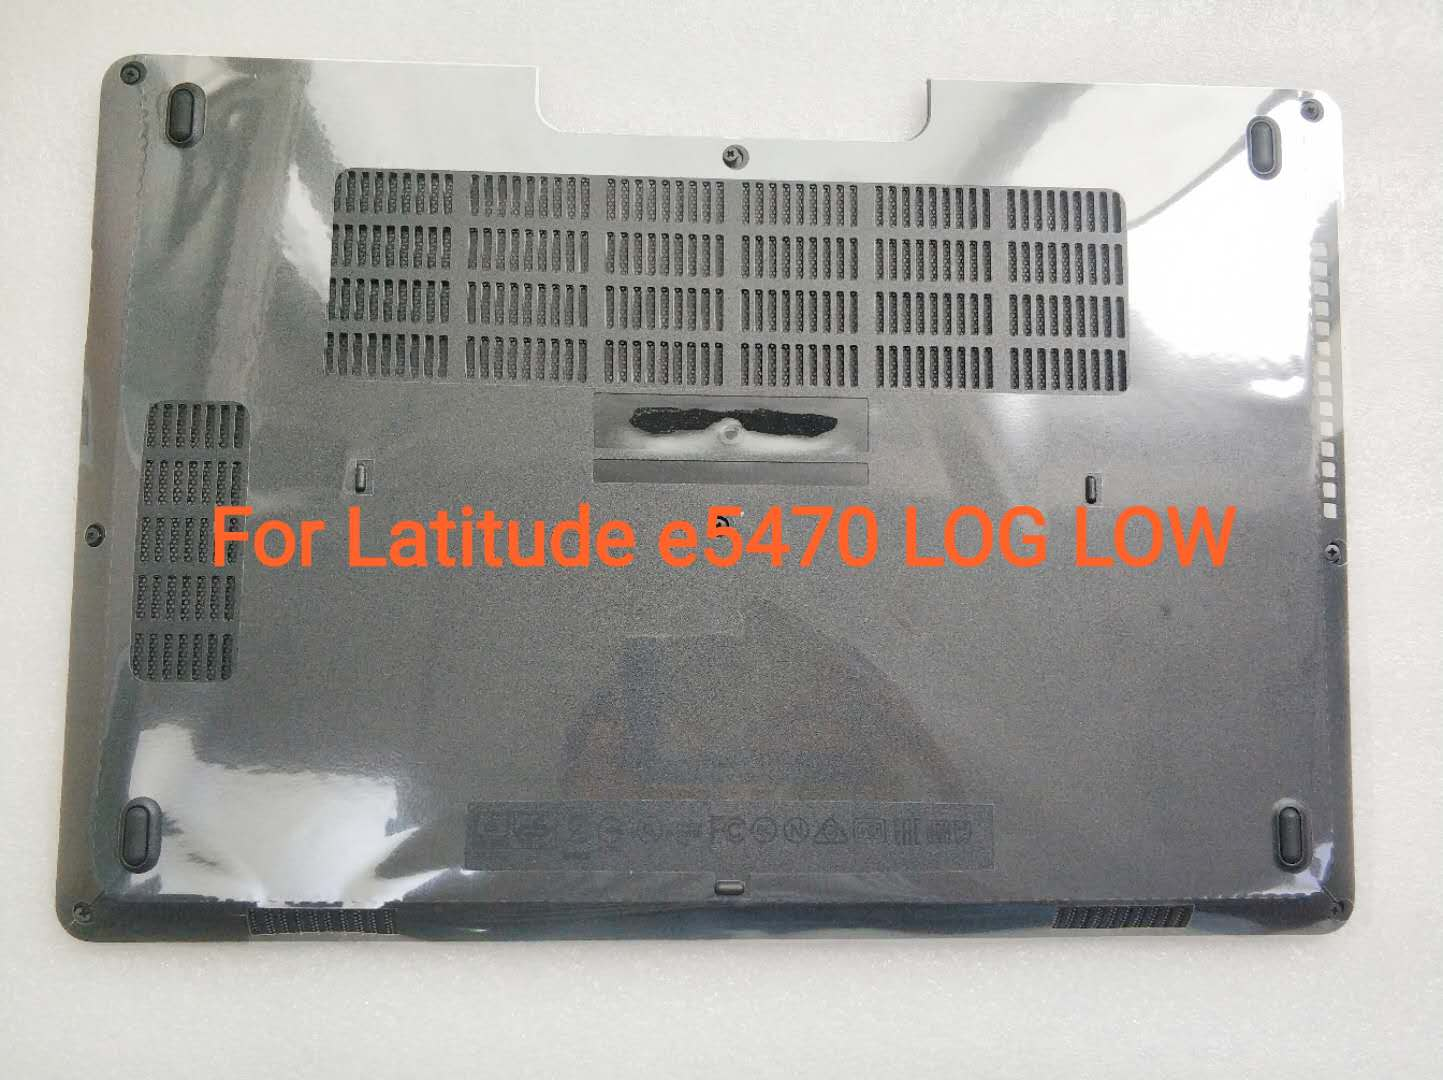 Placa de cubierta inferior para Dell latitude e5470 log DP / N 0TJY1D